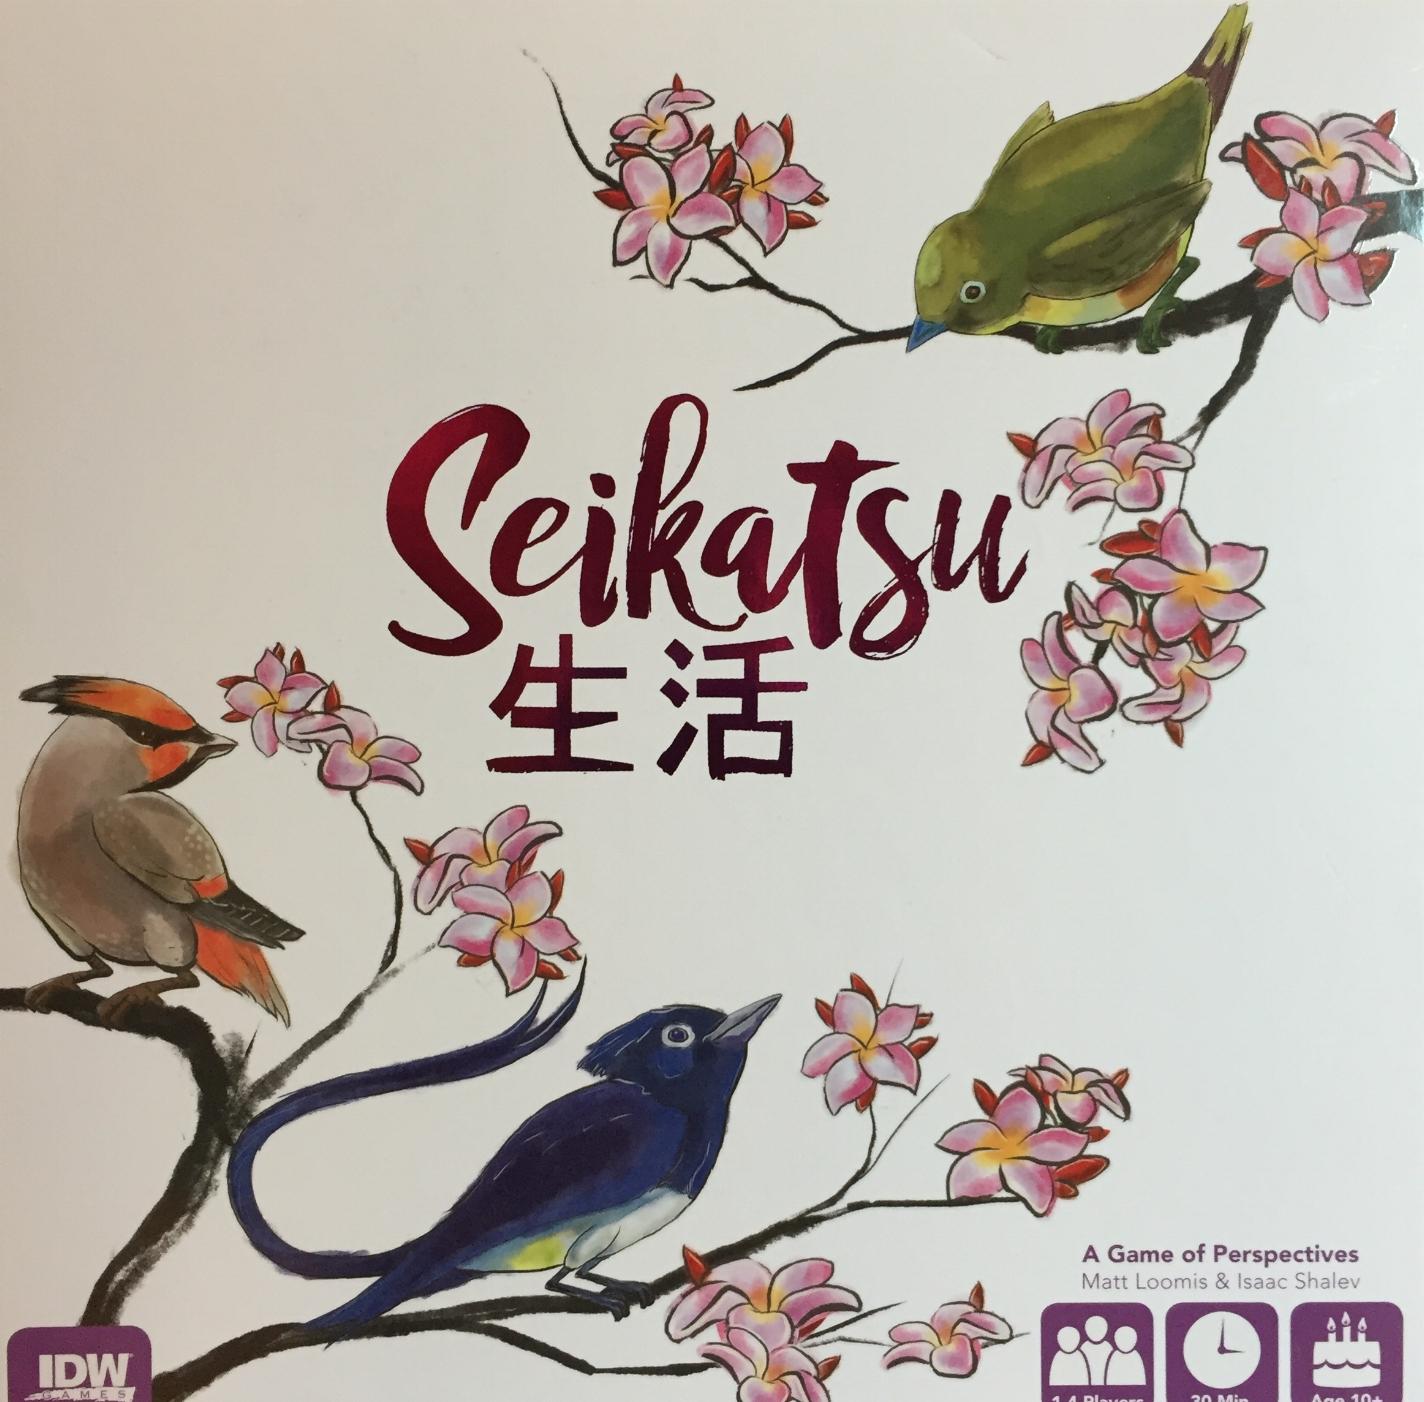 Birds, flowers and deep strategic gameplay.